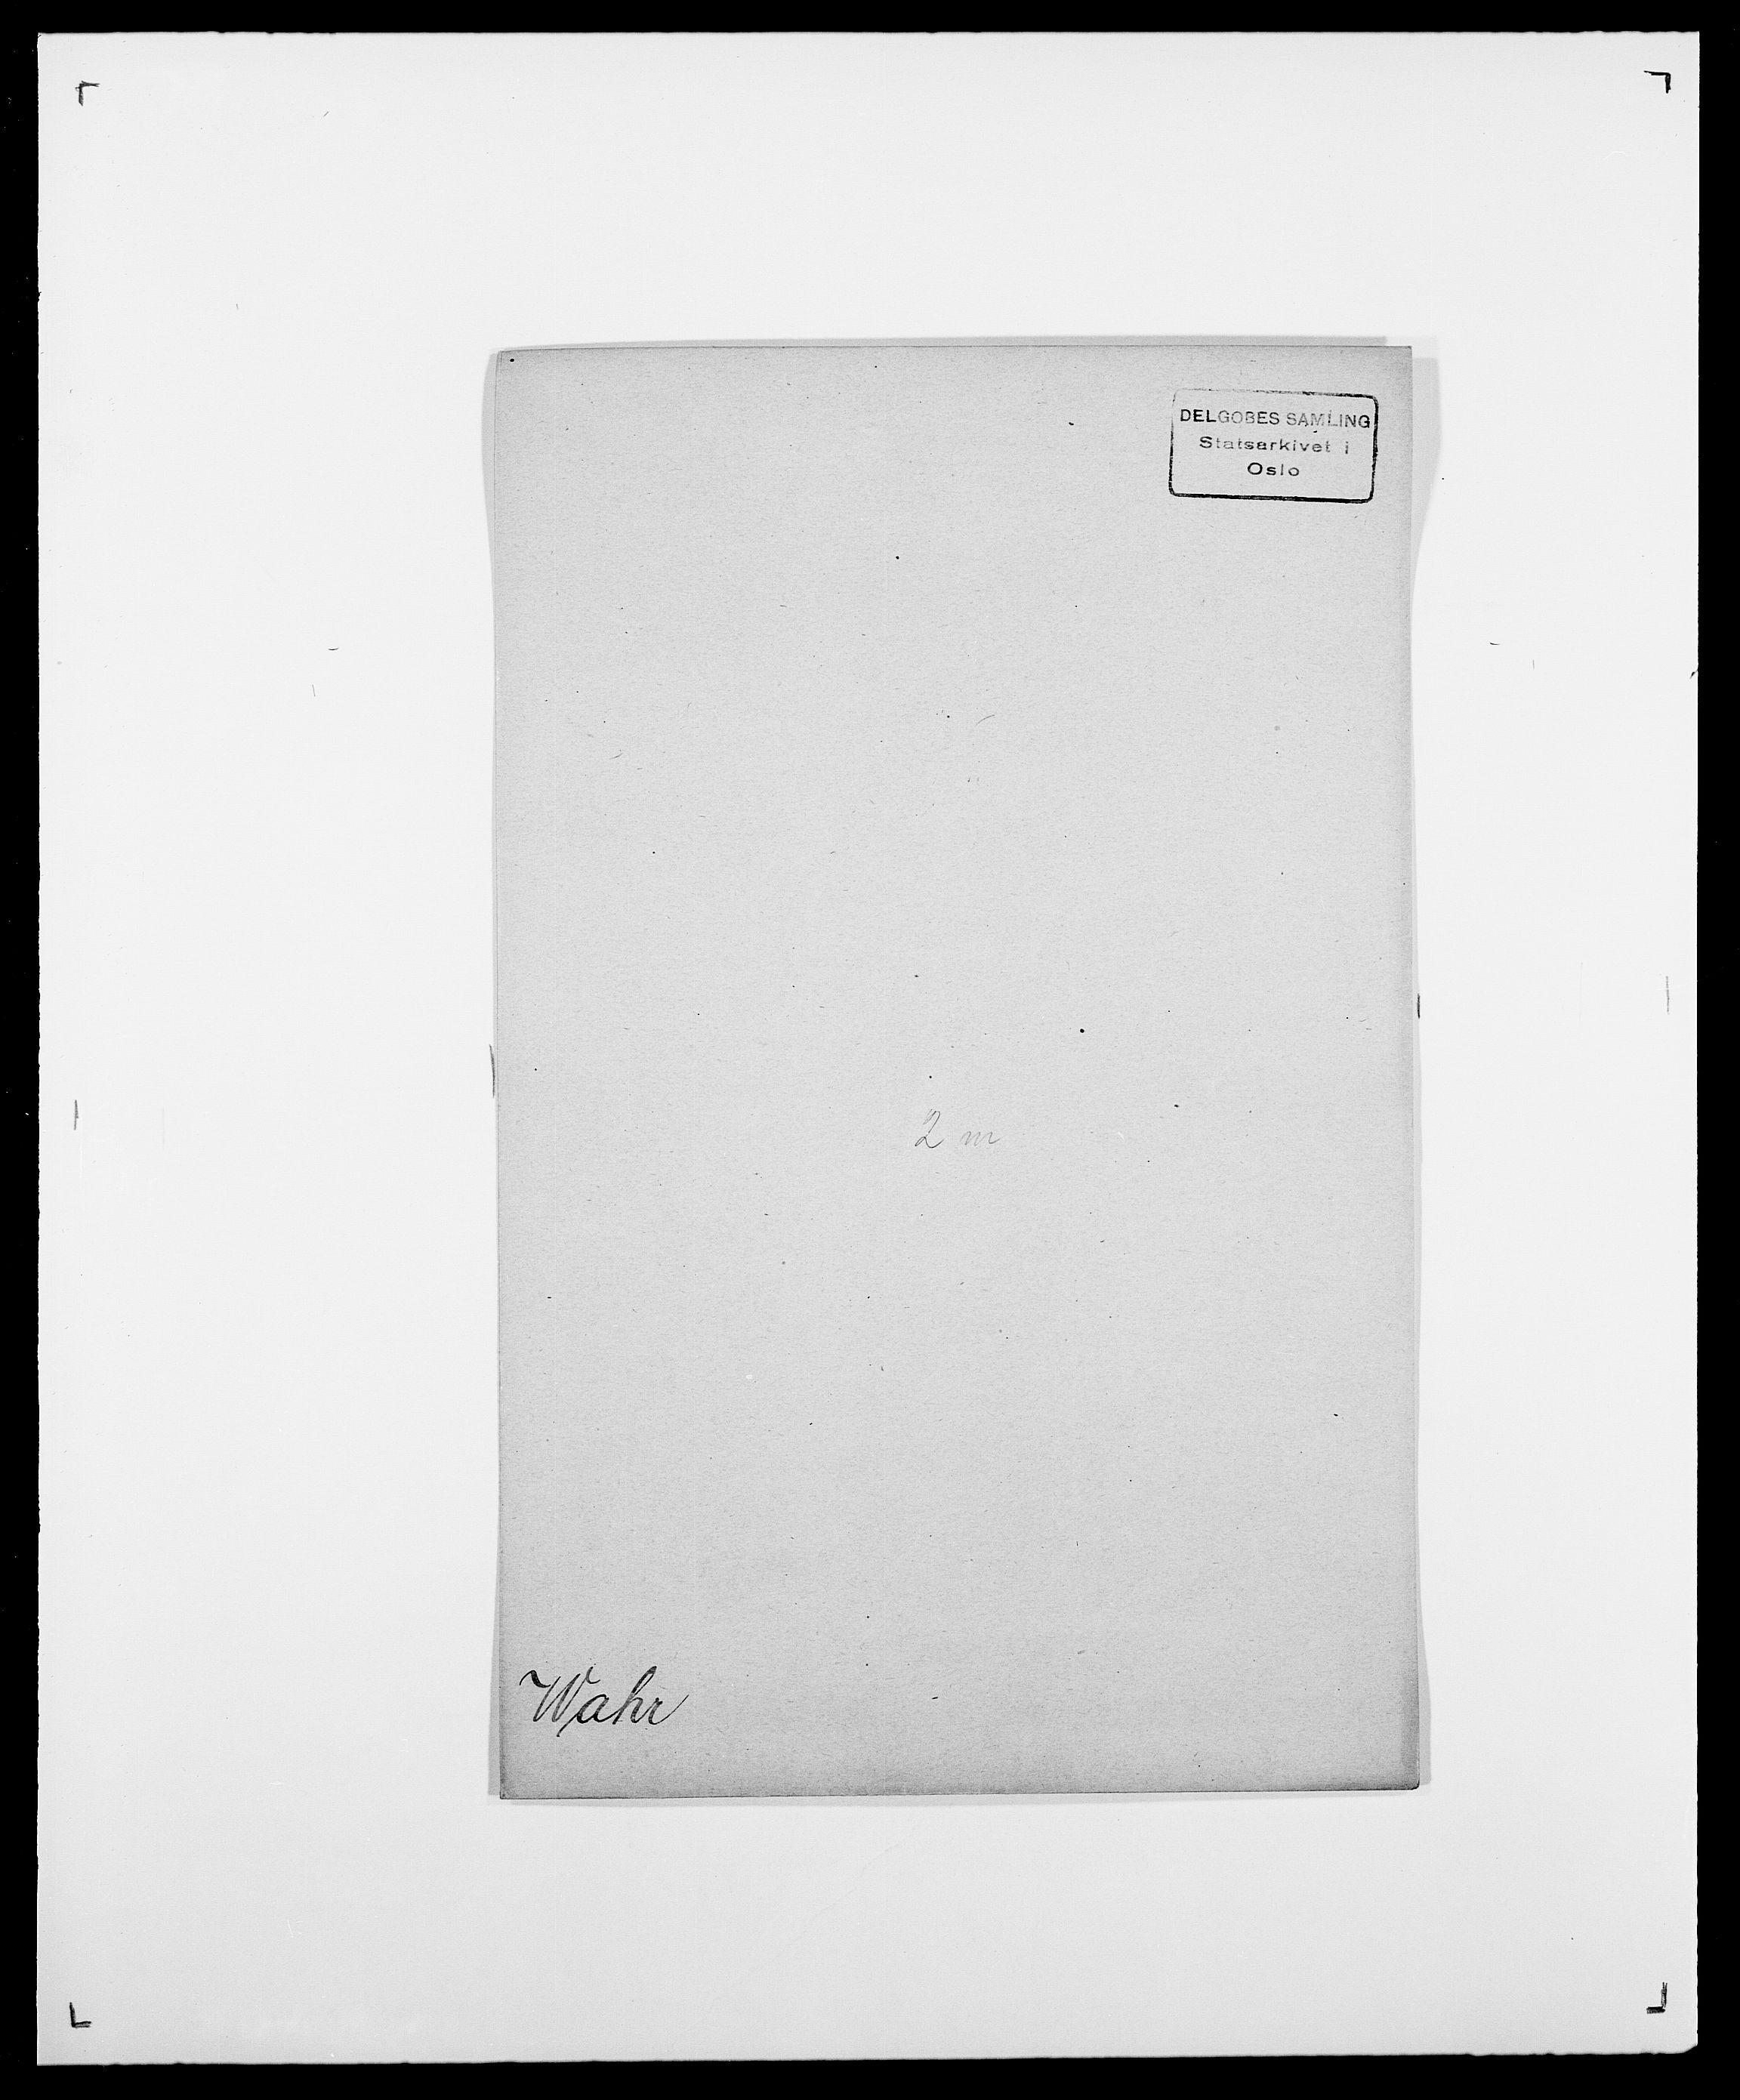 SAO, Delgobe, Charles Antoine - samling, D/Da/L0040: Usgaard - Velund, s. 120